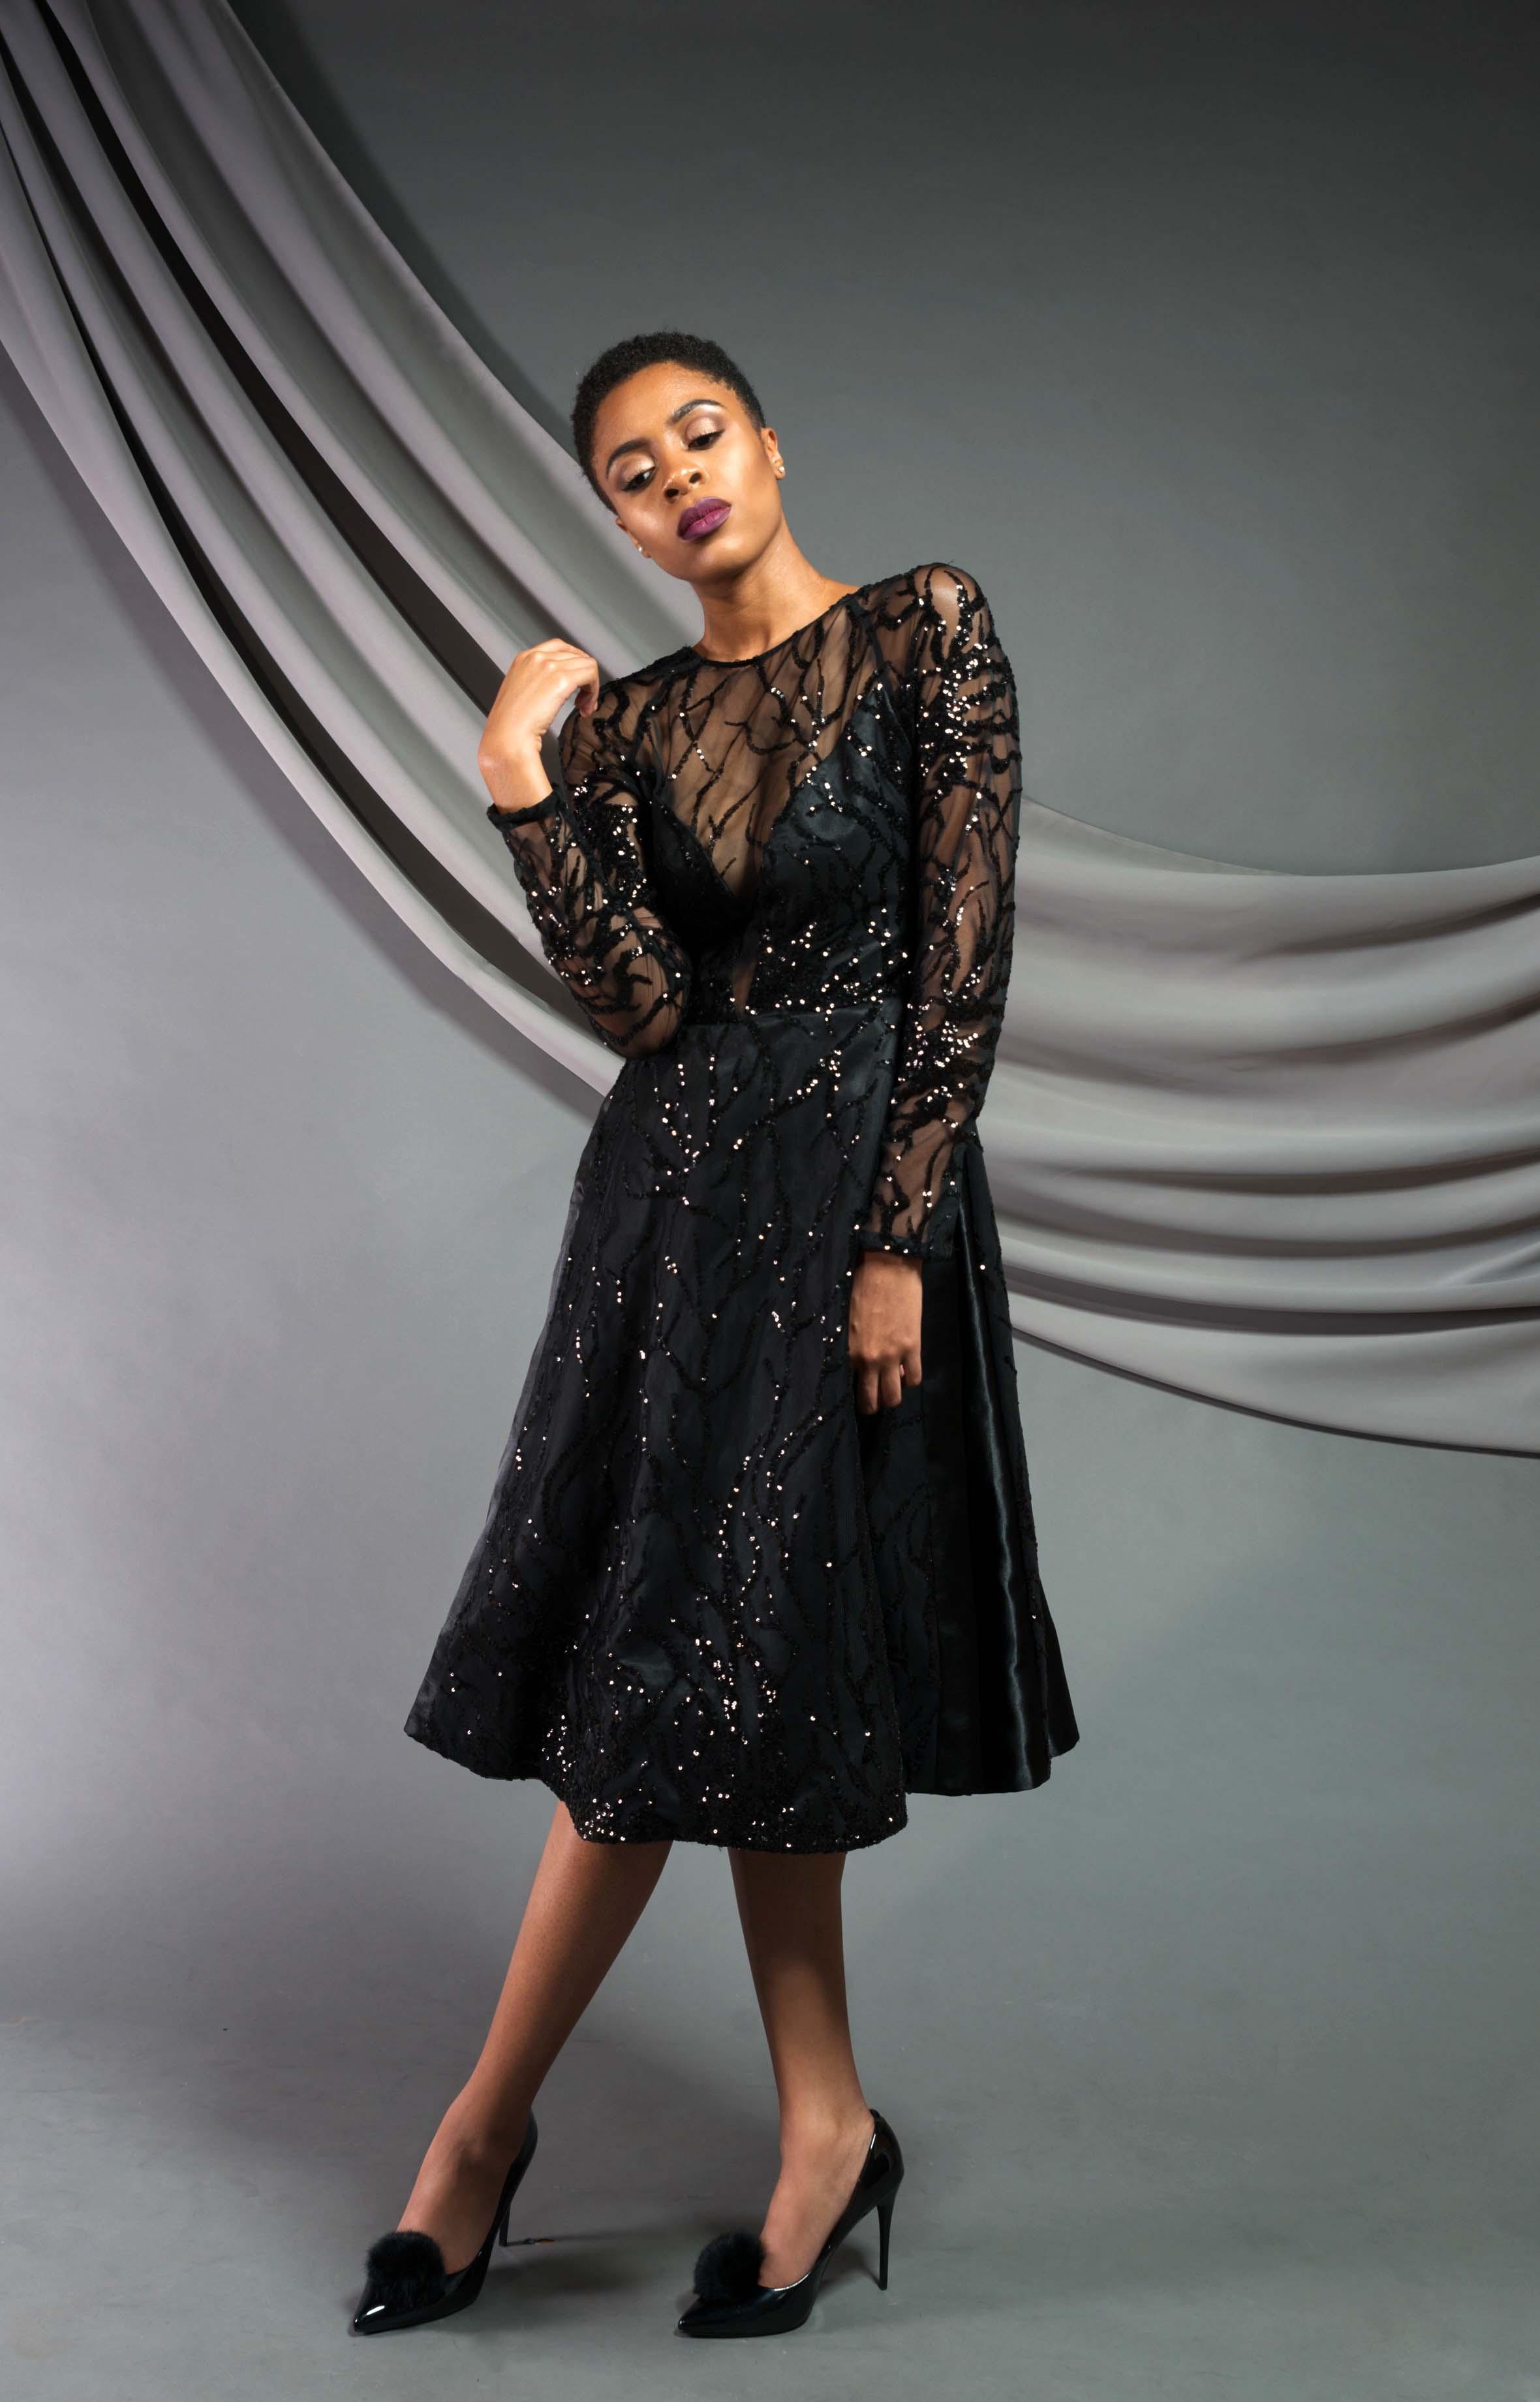 Knee-length sequin flare dress: Patterned Sequin mesh, satin shantung